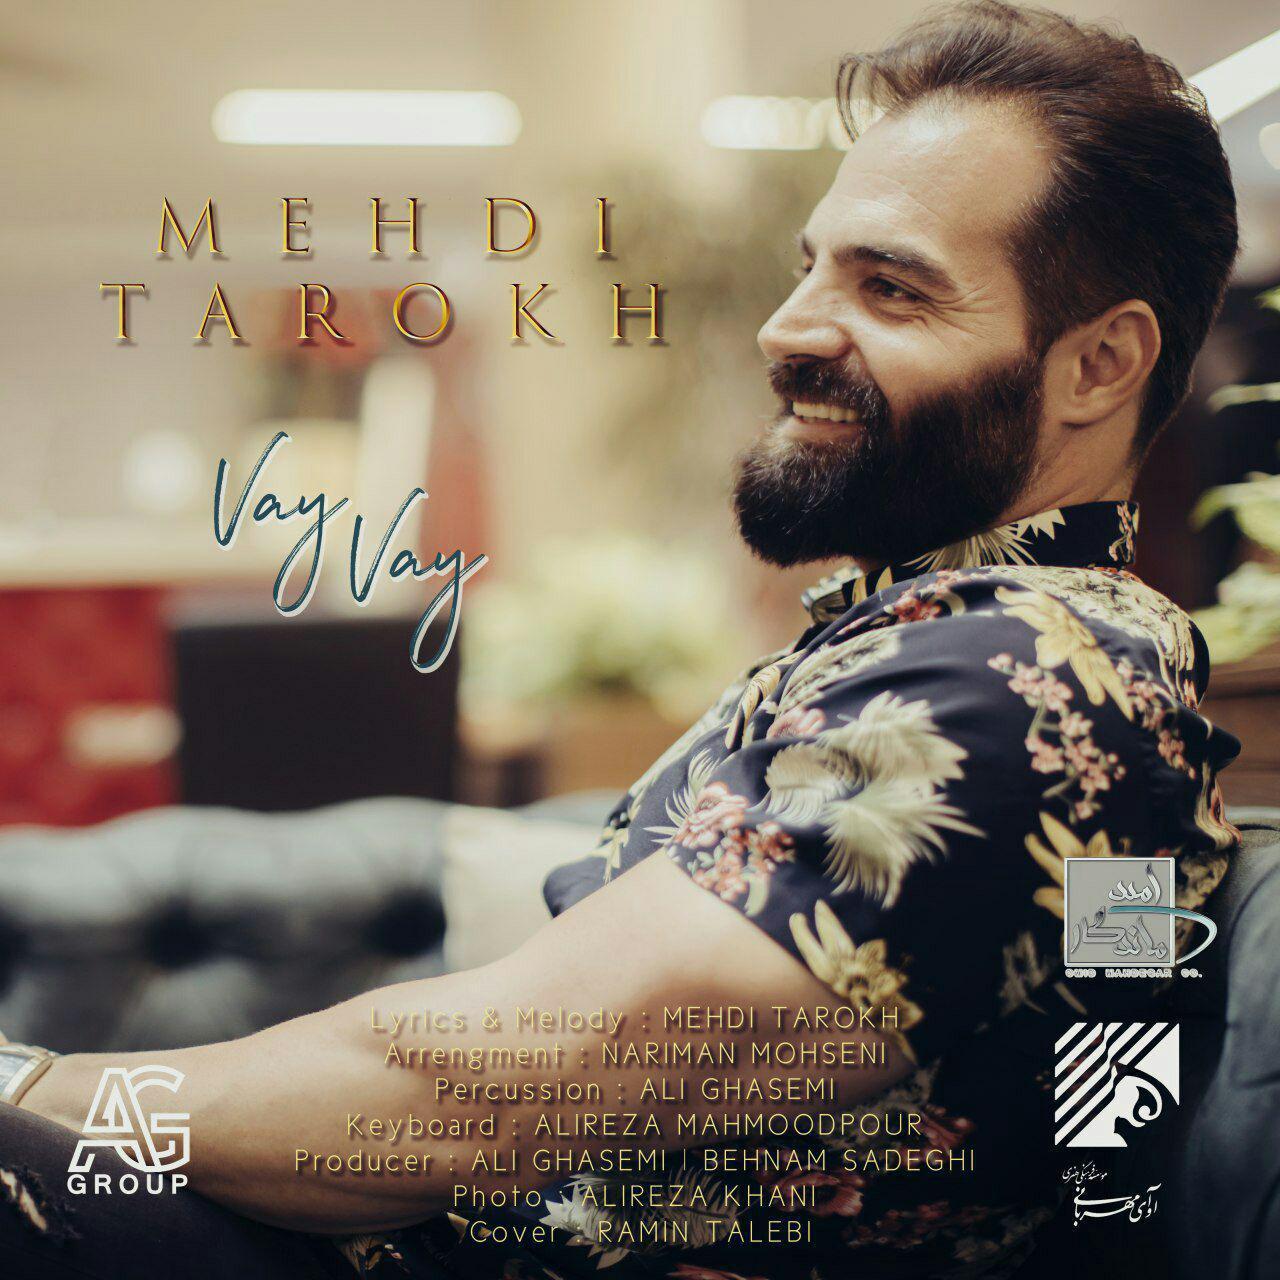 Mehdi Tarokh – Vay Vay